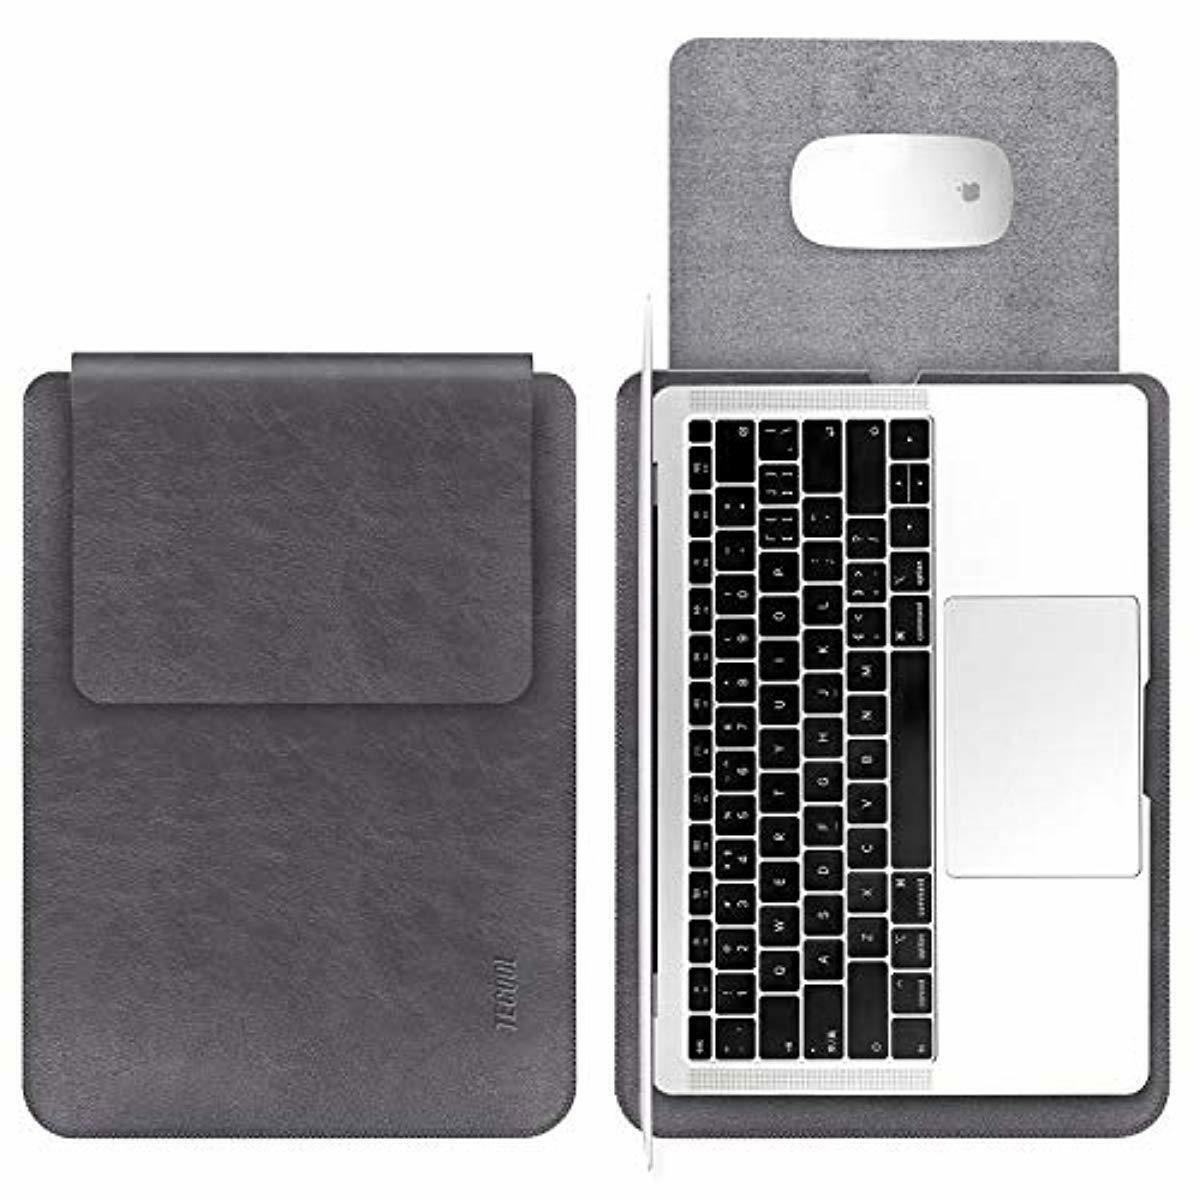 TECOOL Laptop Hülle 13 Zoll Tasche, Laptop Sleeve Kunstleder Schutzhülle Case